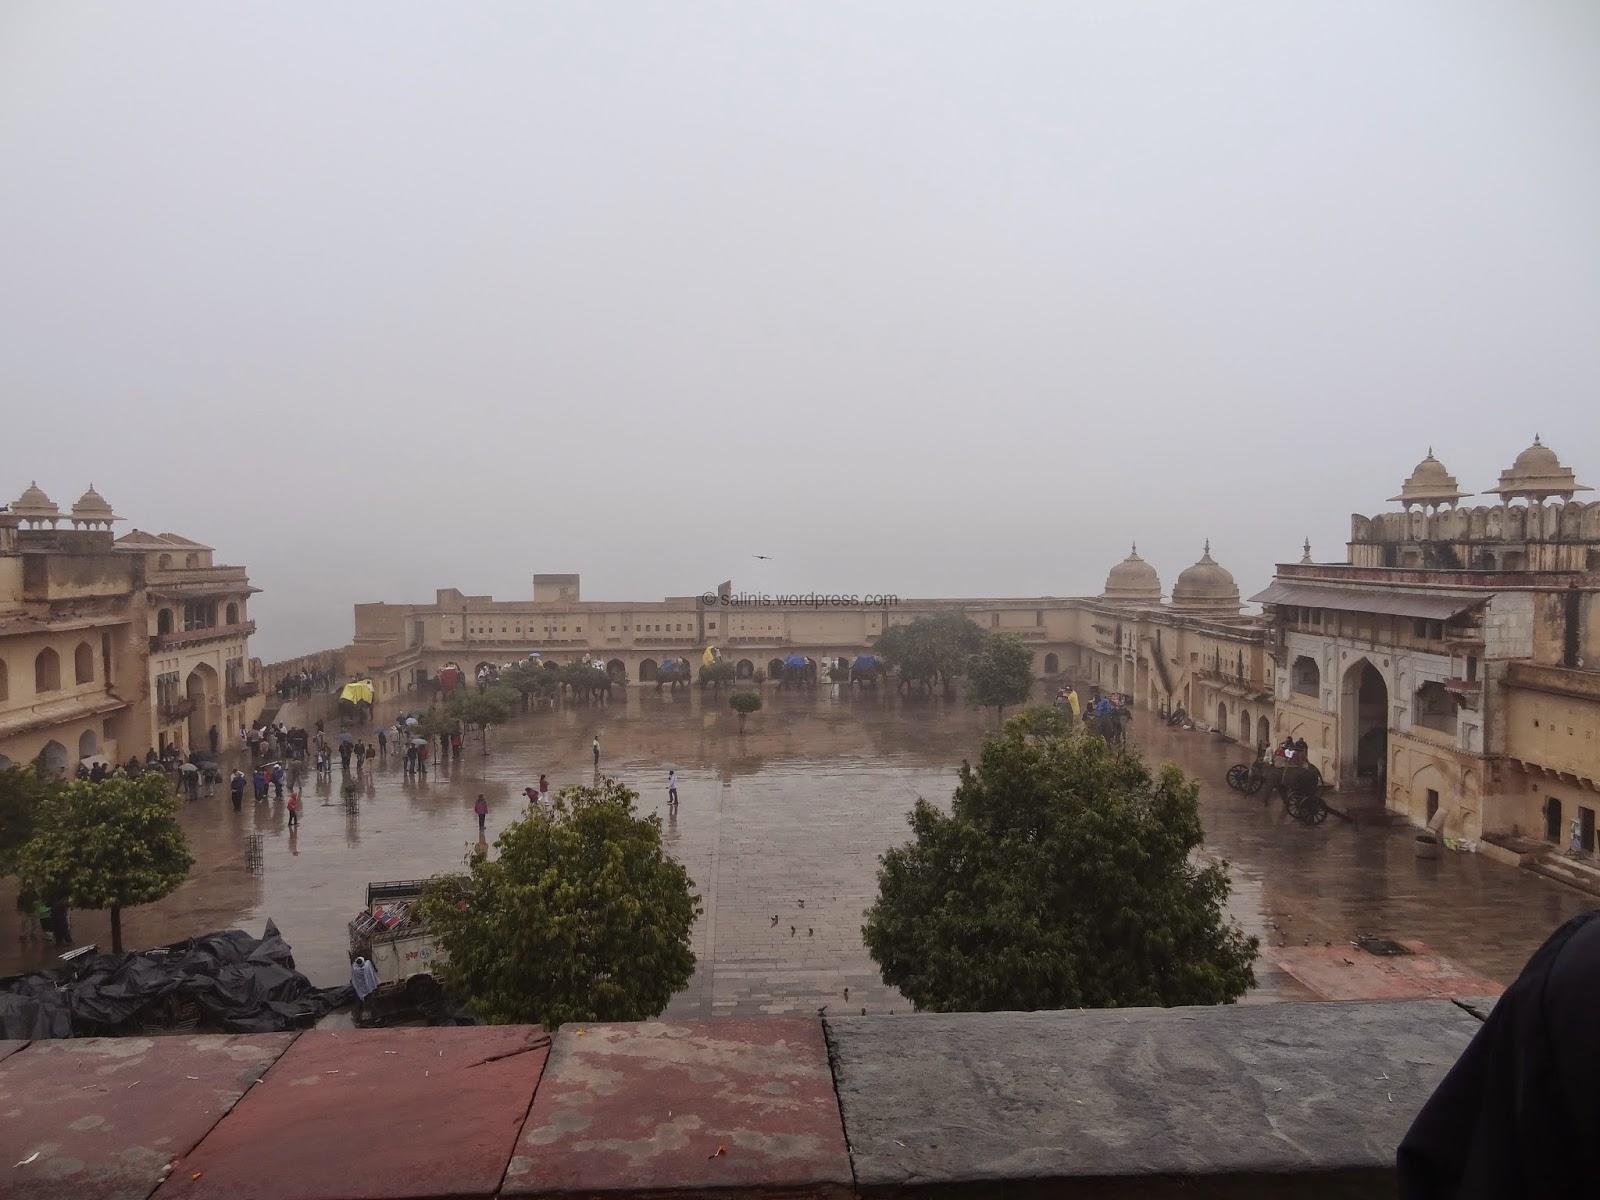 Jaleb Chowk, Courtyard of Amber fort - Rajasthan India - Pick, Pack, Go